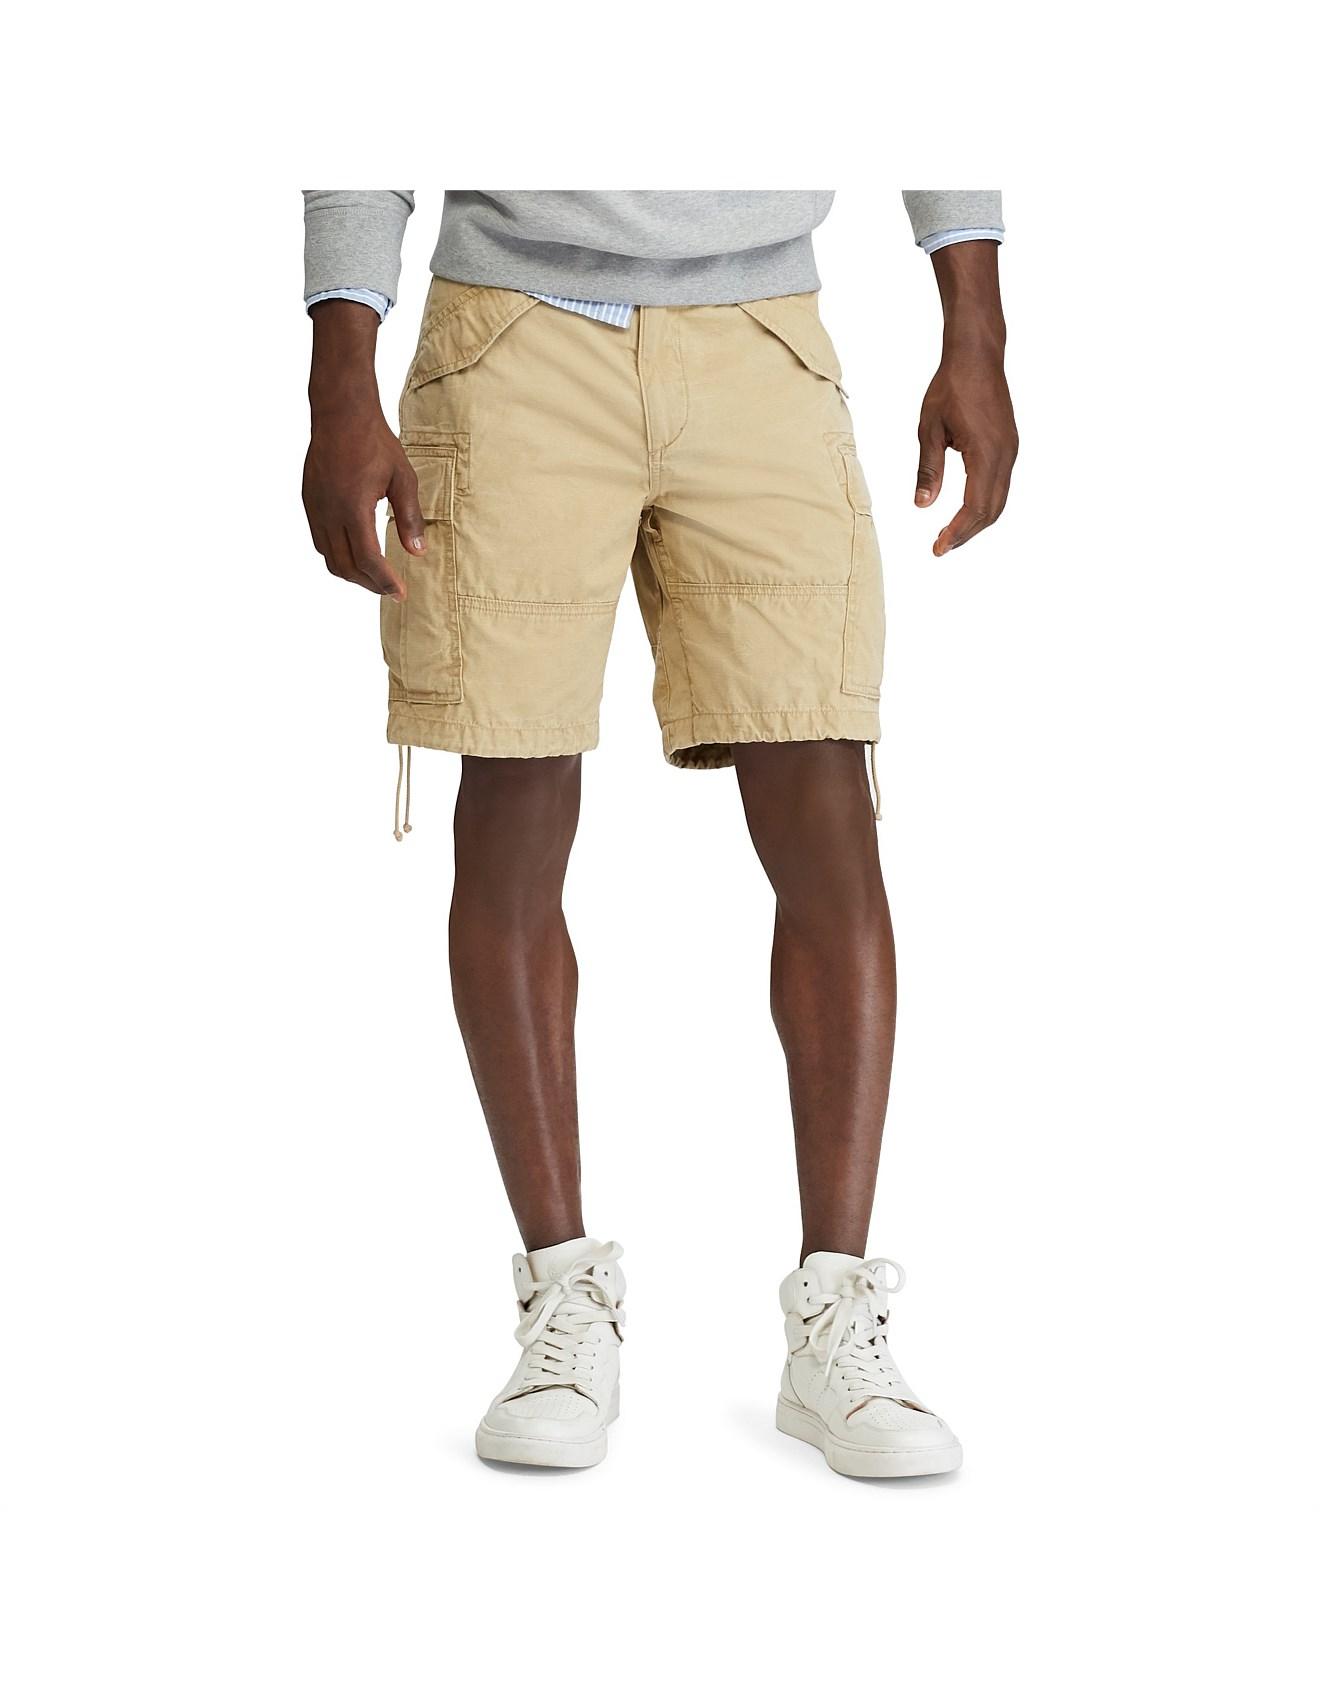 fbceed477c Mens Classic Fit Cotton Cargo Short. 1; 2; 3. Zoom. Polo Ralph Lauren